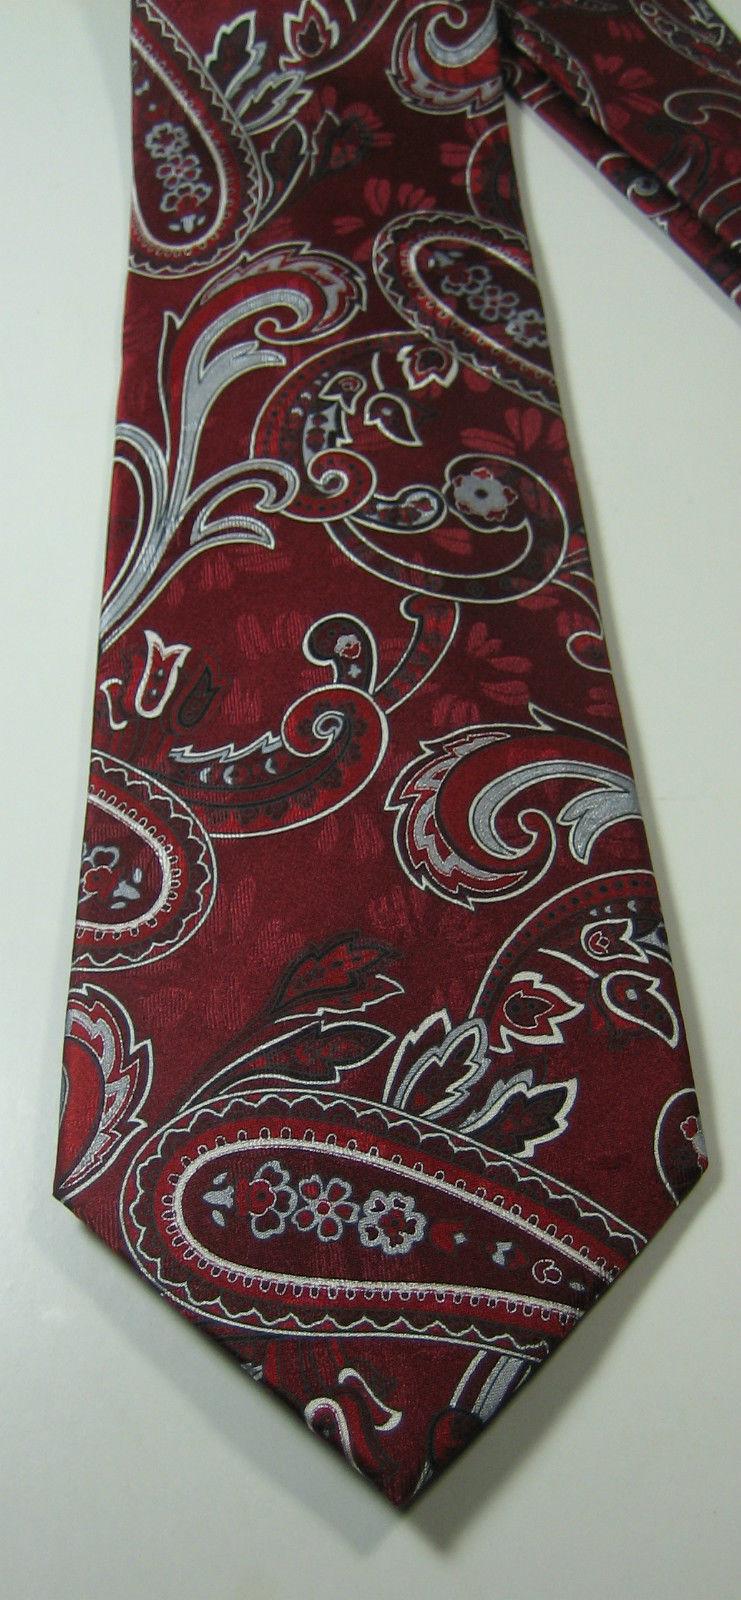 GEOFFREY BEENE Rich Red Gray Paisley Tie 100% Silk Excellent RARE